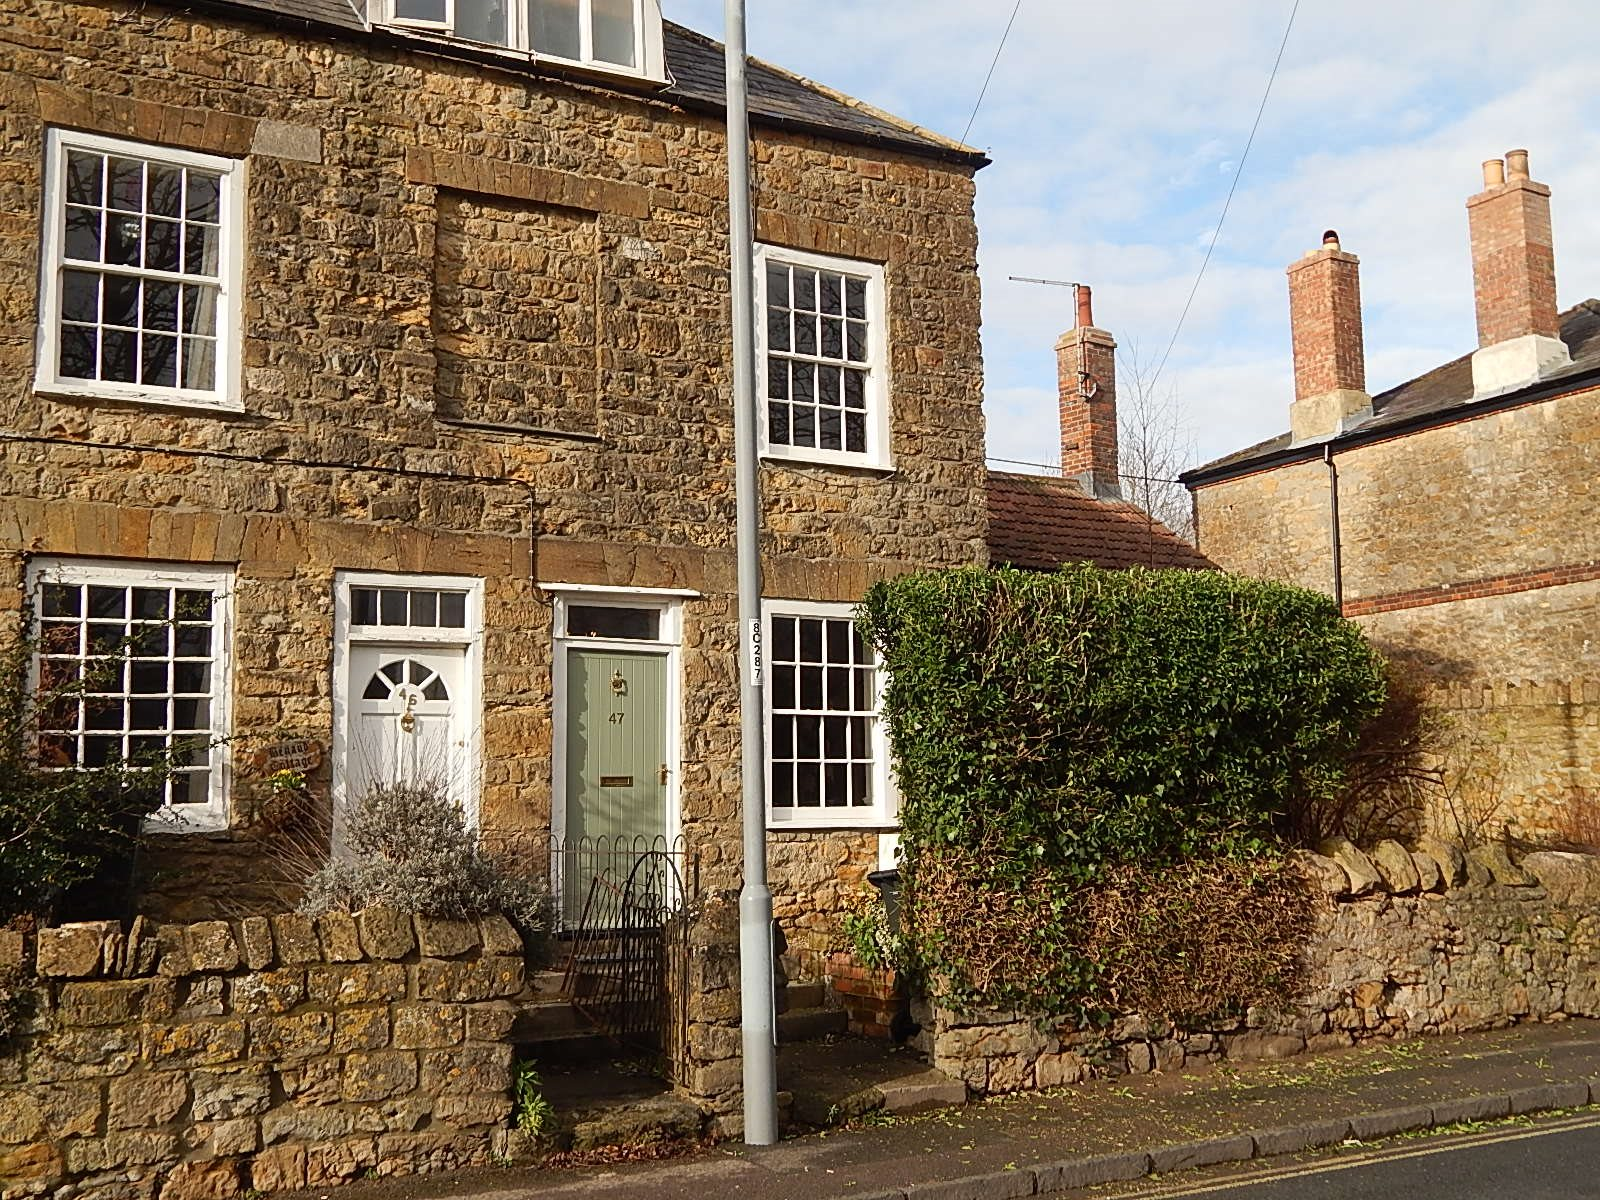 Coldharbour, Sherborne, Dorset